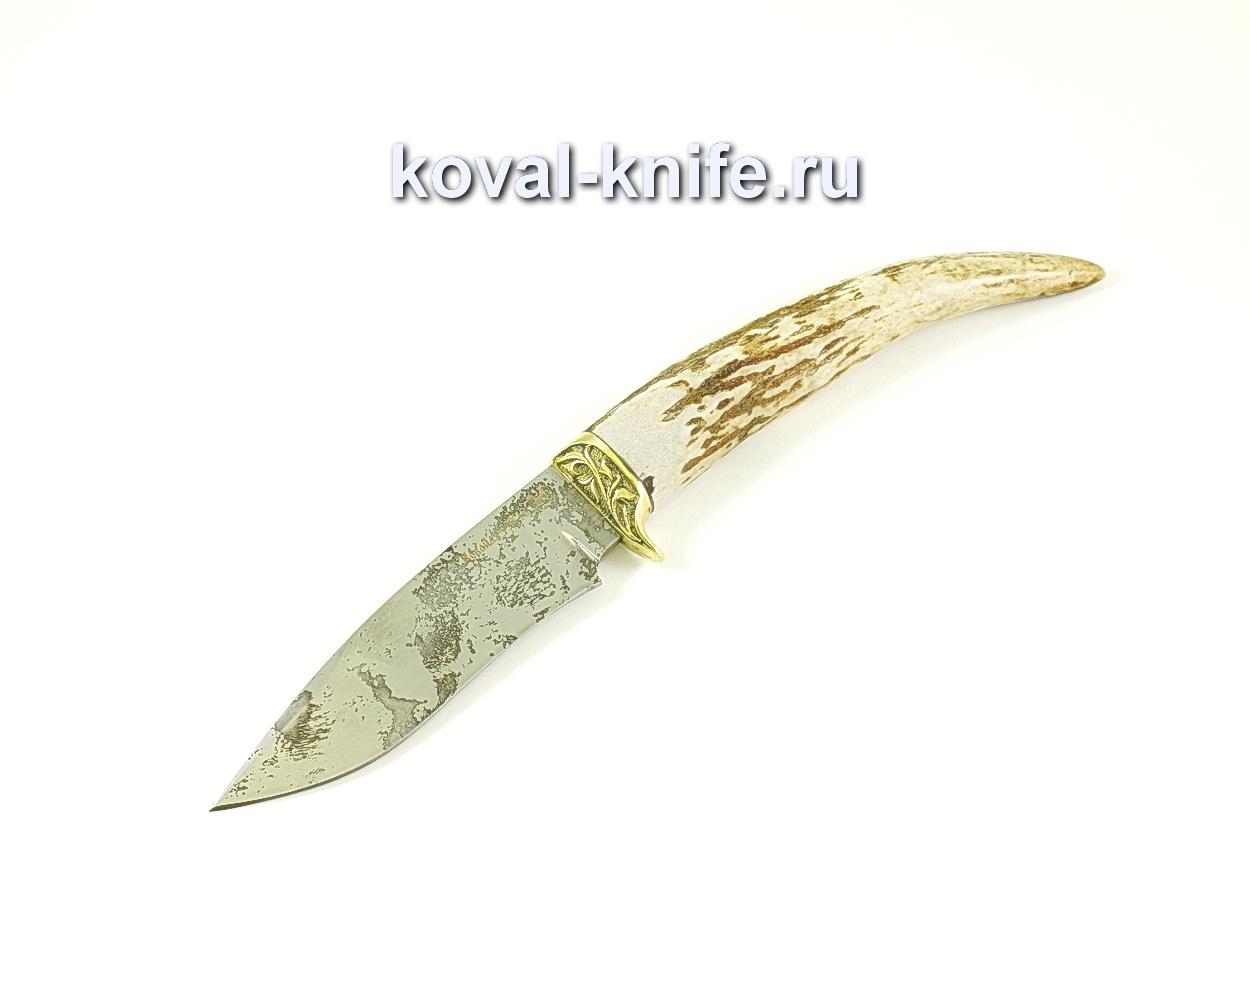 Нож Сапсан (сталь 95х18), рукоять рог, литье